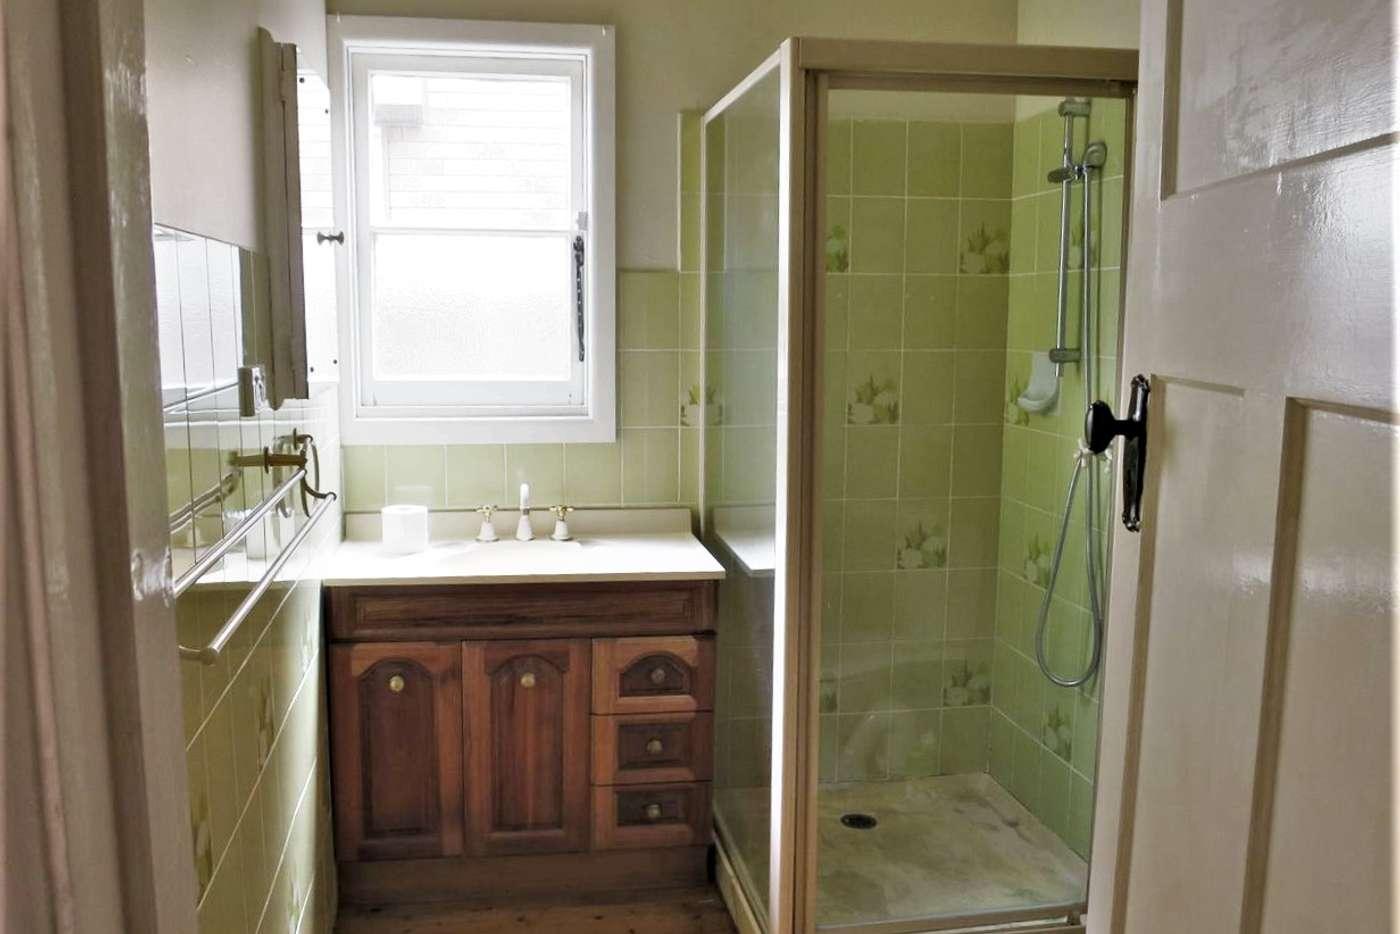 Seventh view of Homely house listing, 3 Devon Street, Preston VIC 3072